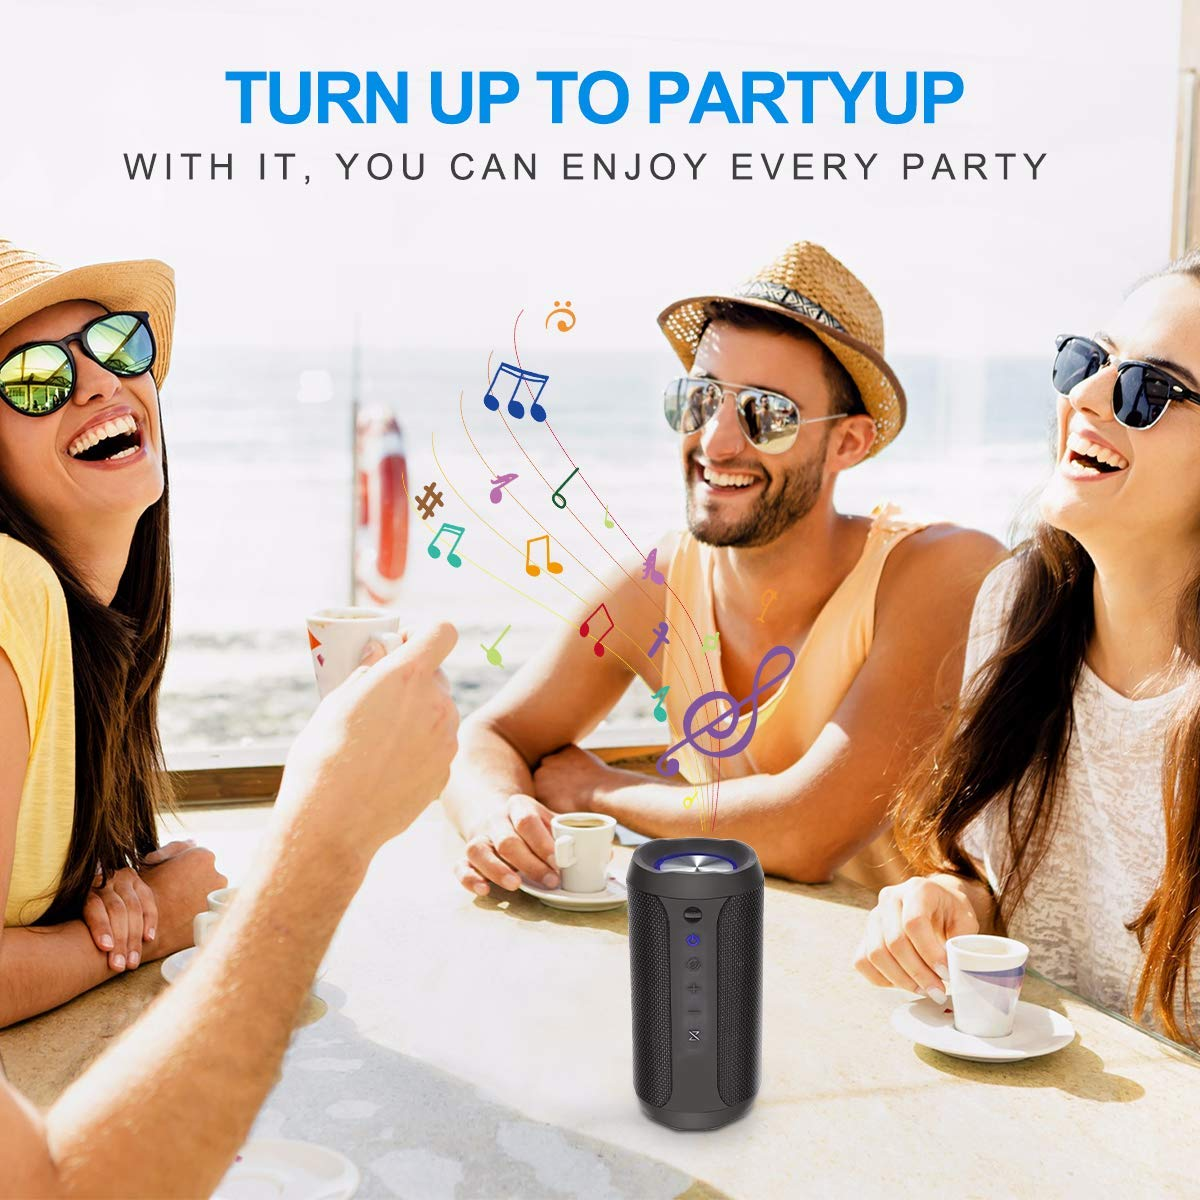 12 Ore di Riproduzione 4.2 Bluetooth Subwoofer Shockproof Speakers BACKTURE Altoparlante Bluetooth IPX7 Waterproof Senza Fili Cassa Bluetooth Portatile con LED Luce Chiamata Vivavoce TWS Stereo